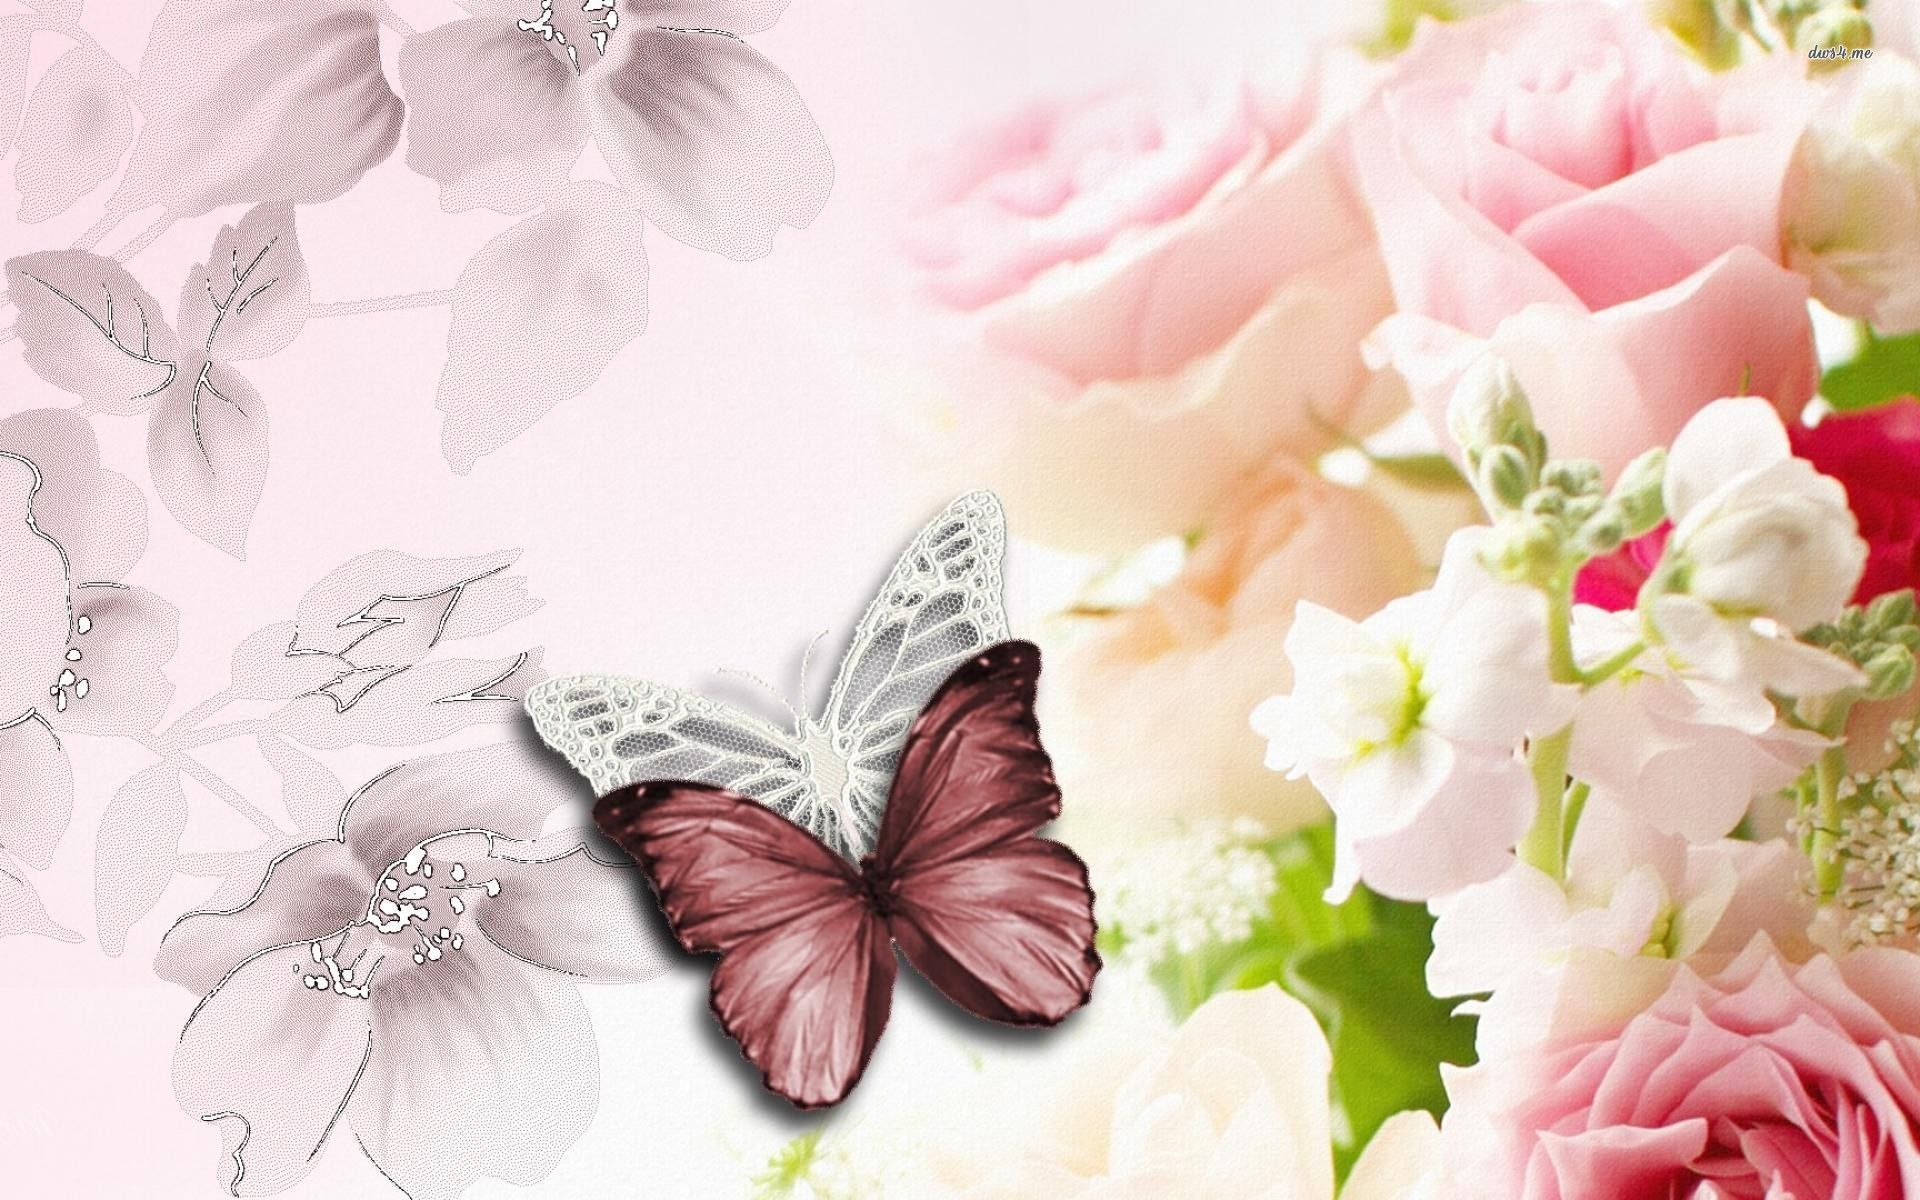 Free Download Flowers And Butterflies Wallpaper Digital Art